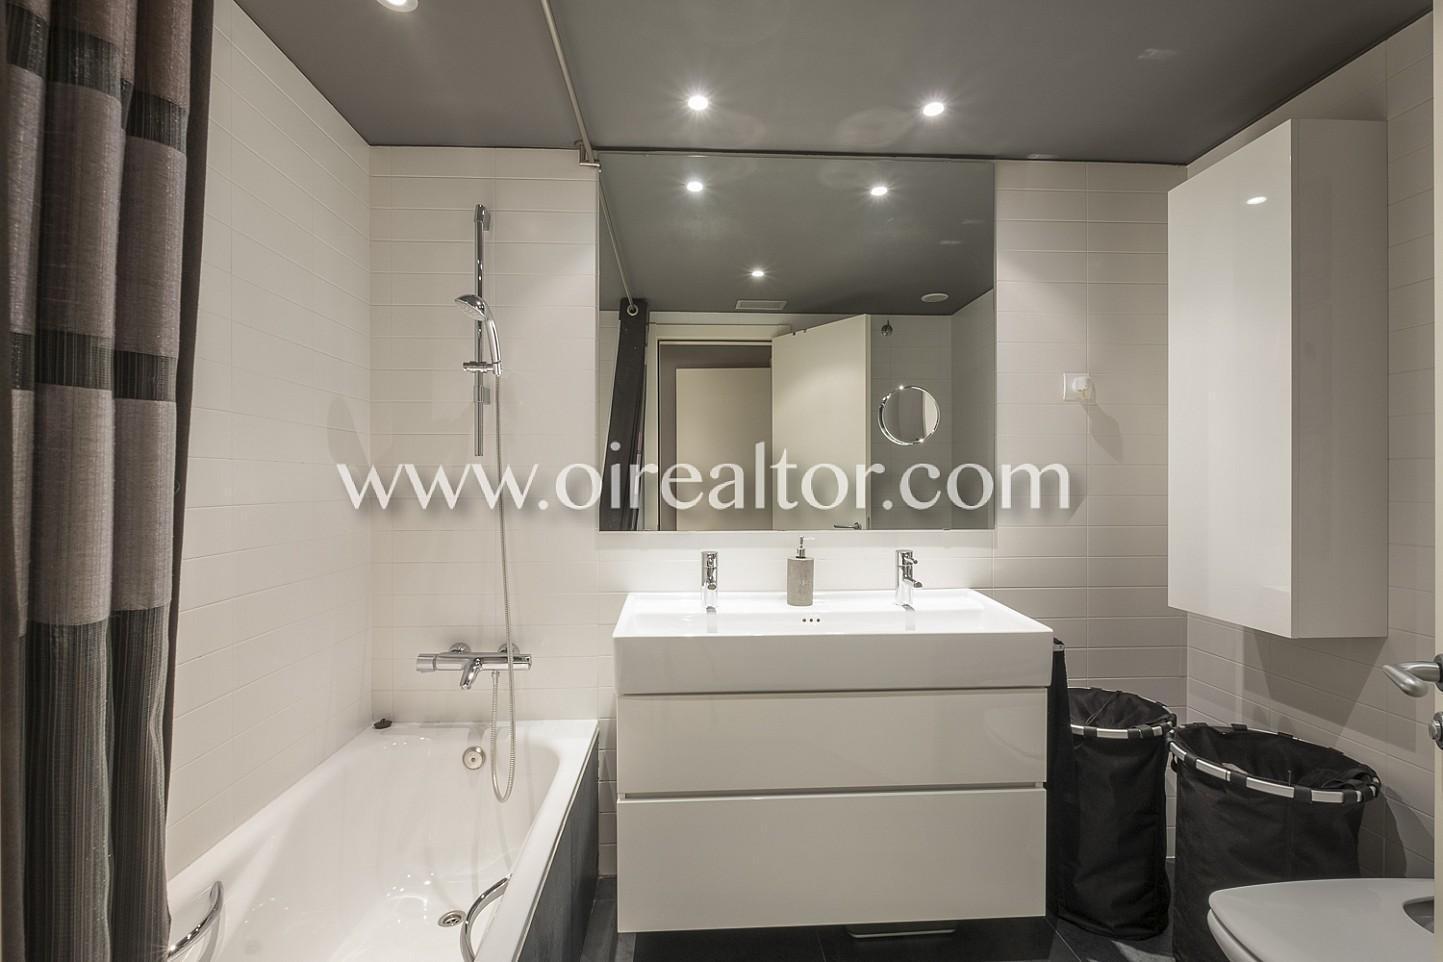 Baño, baño completo, lavabo, baño equipado, bañera